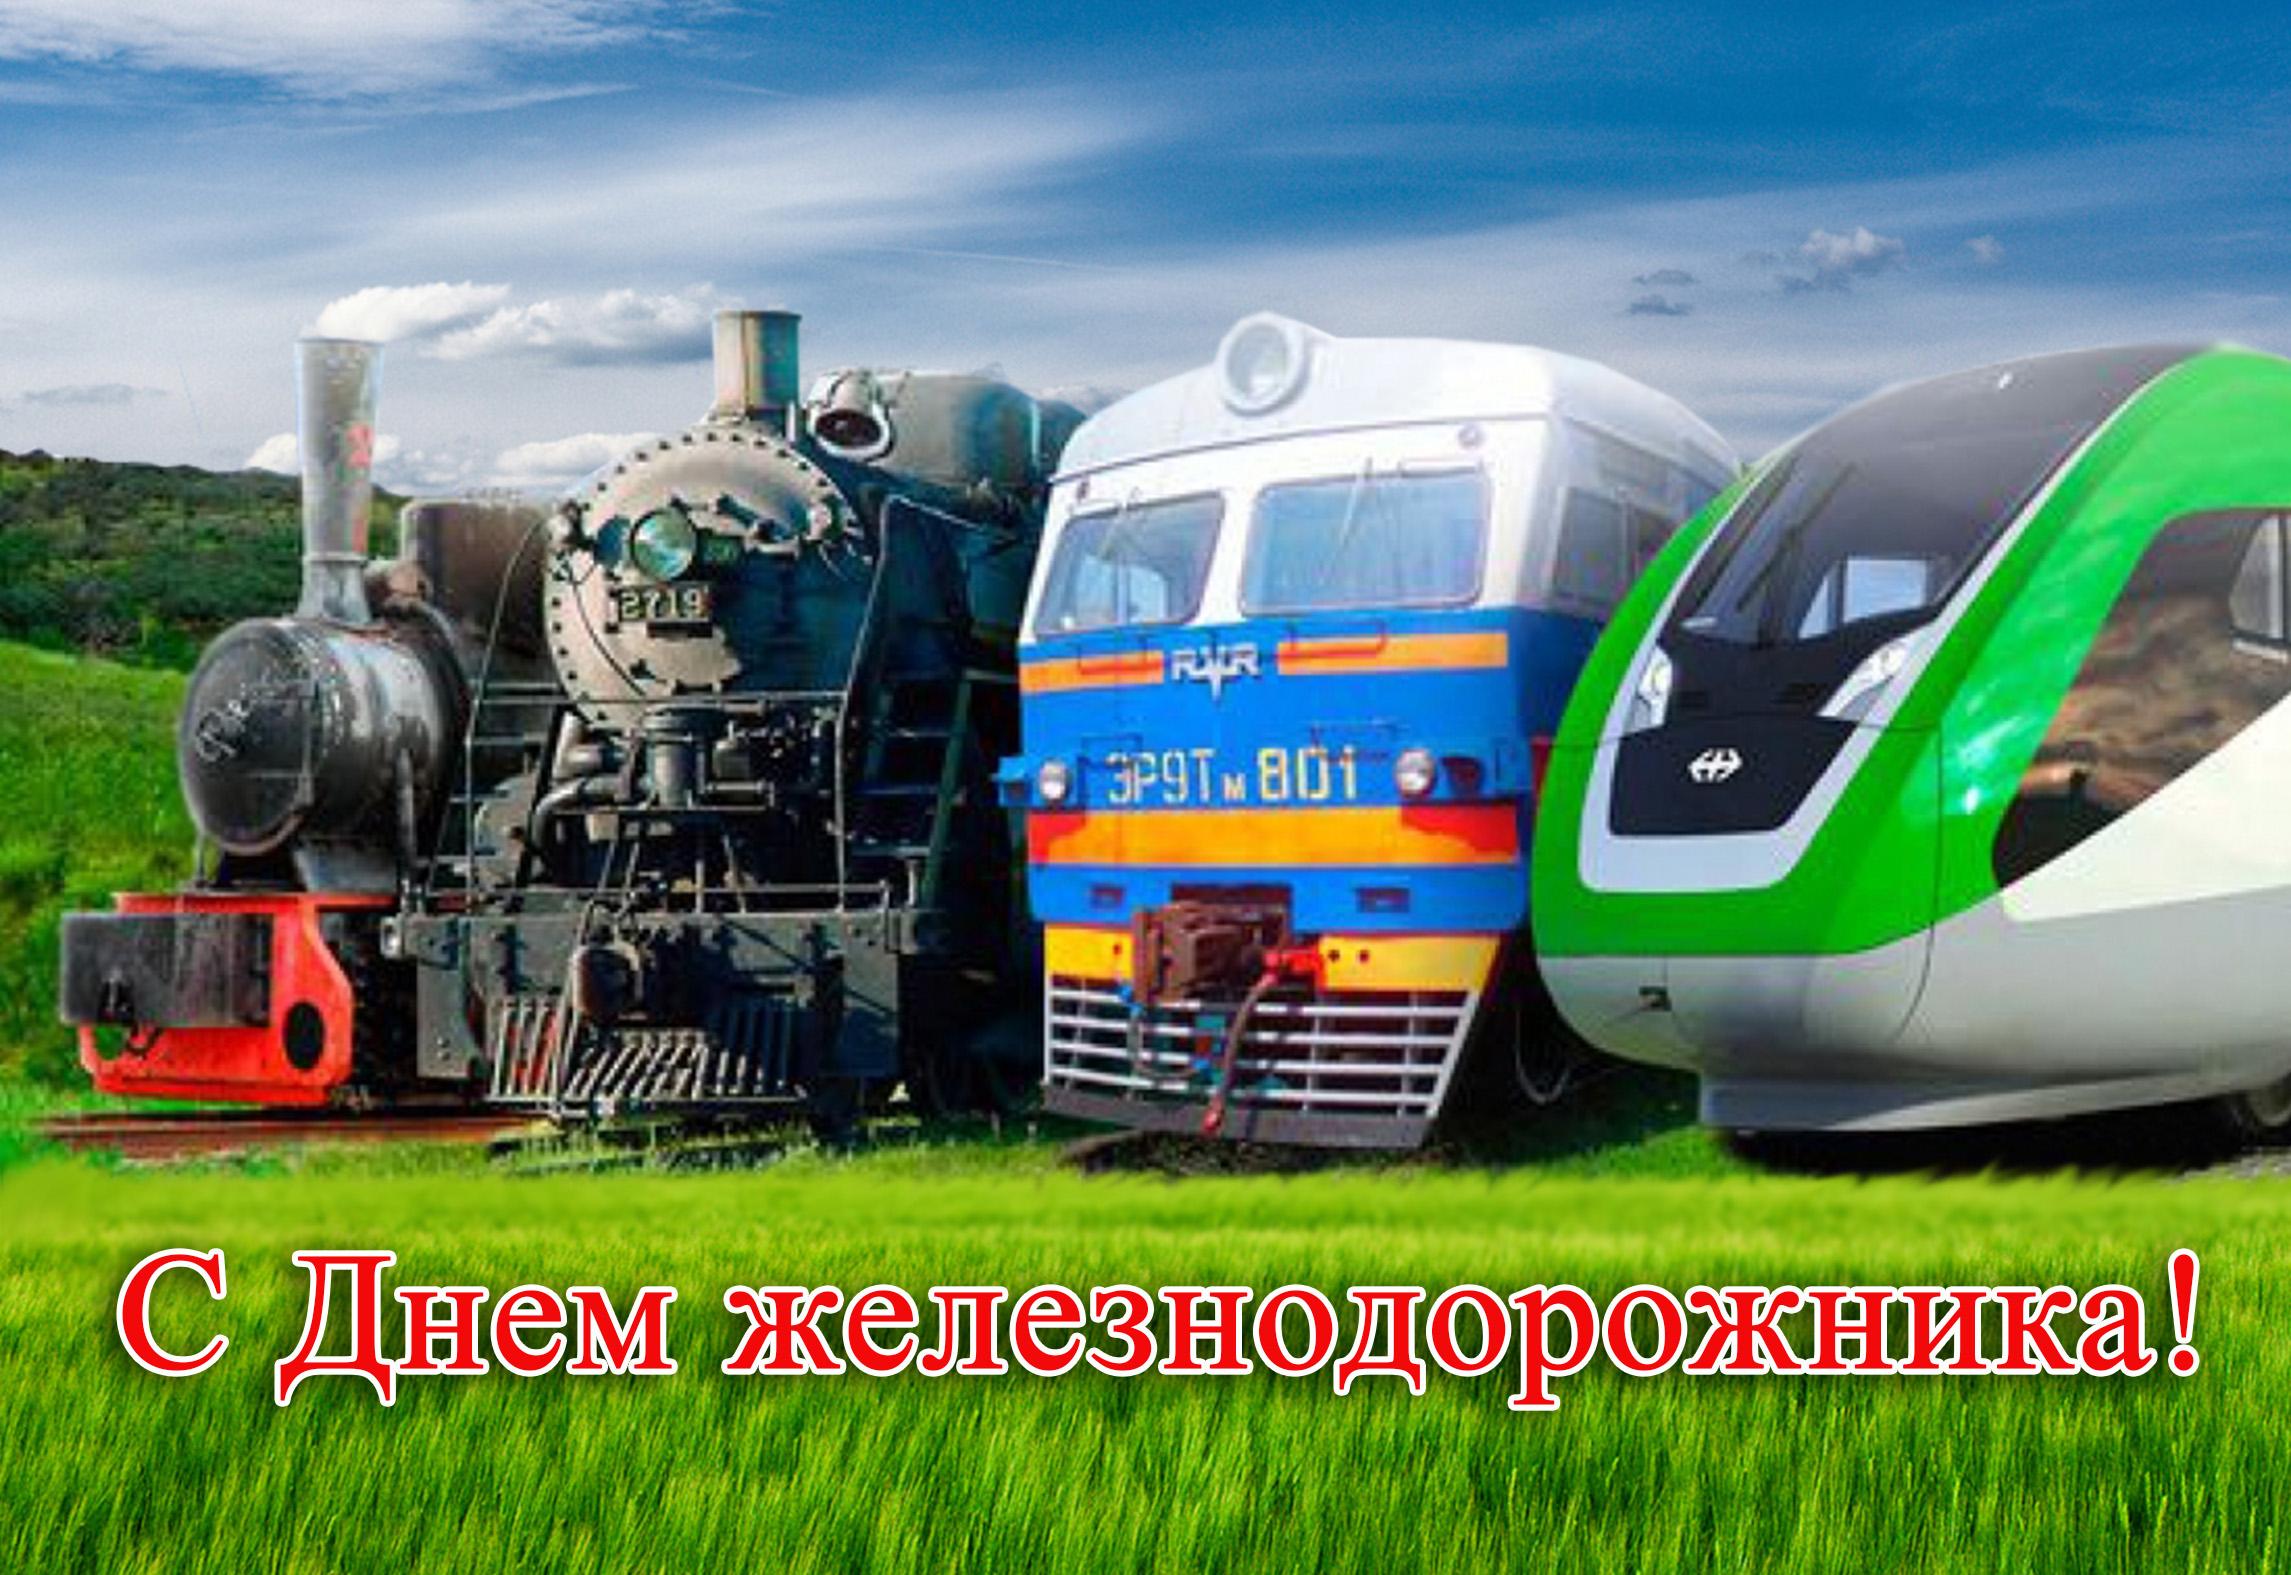 Картинки с днем железнодорожника 2019, голден